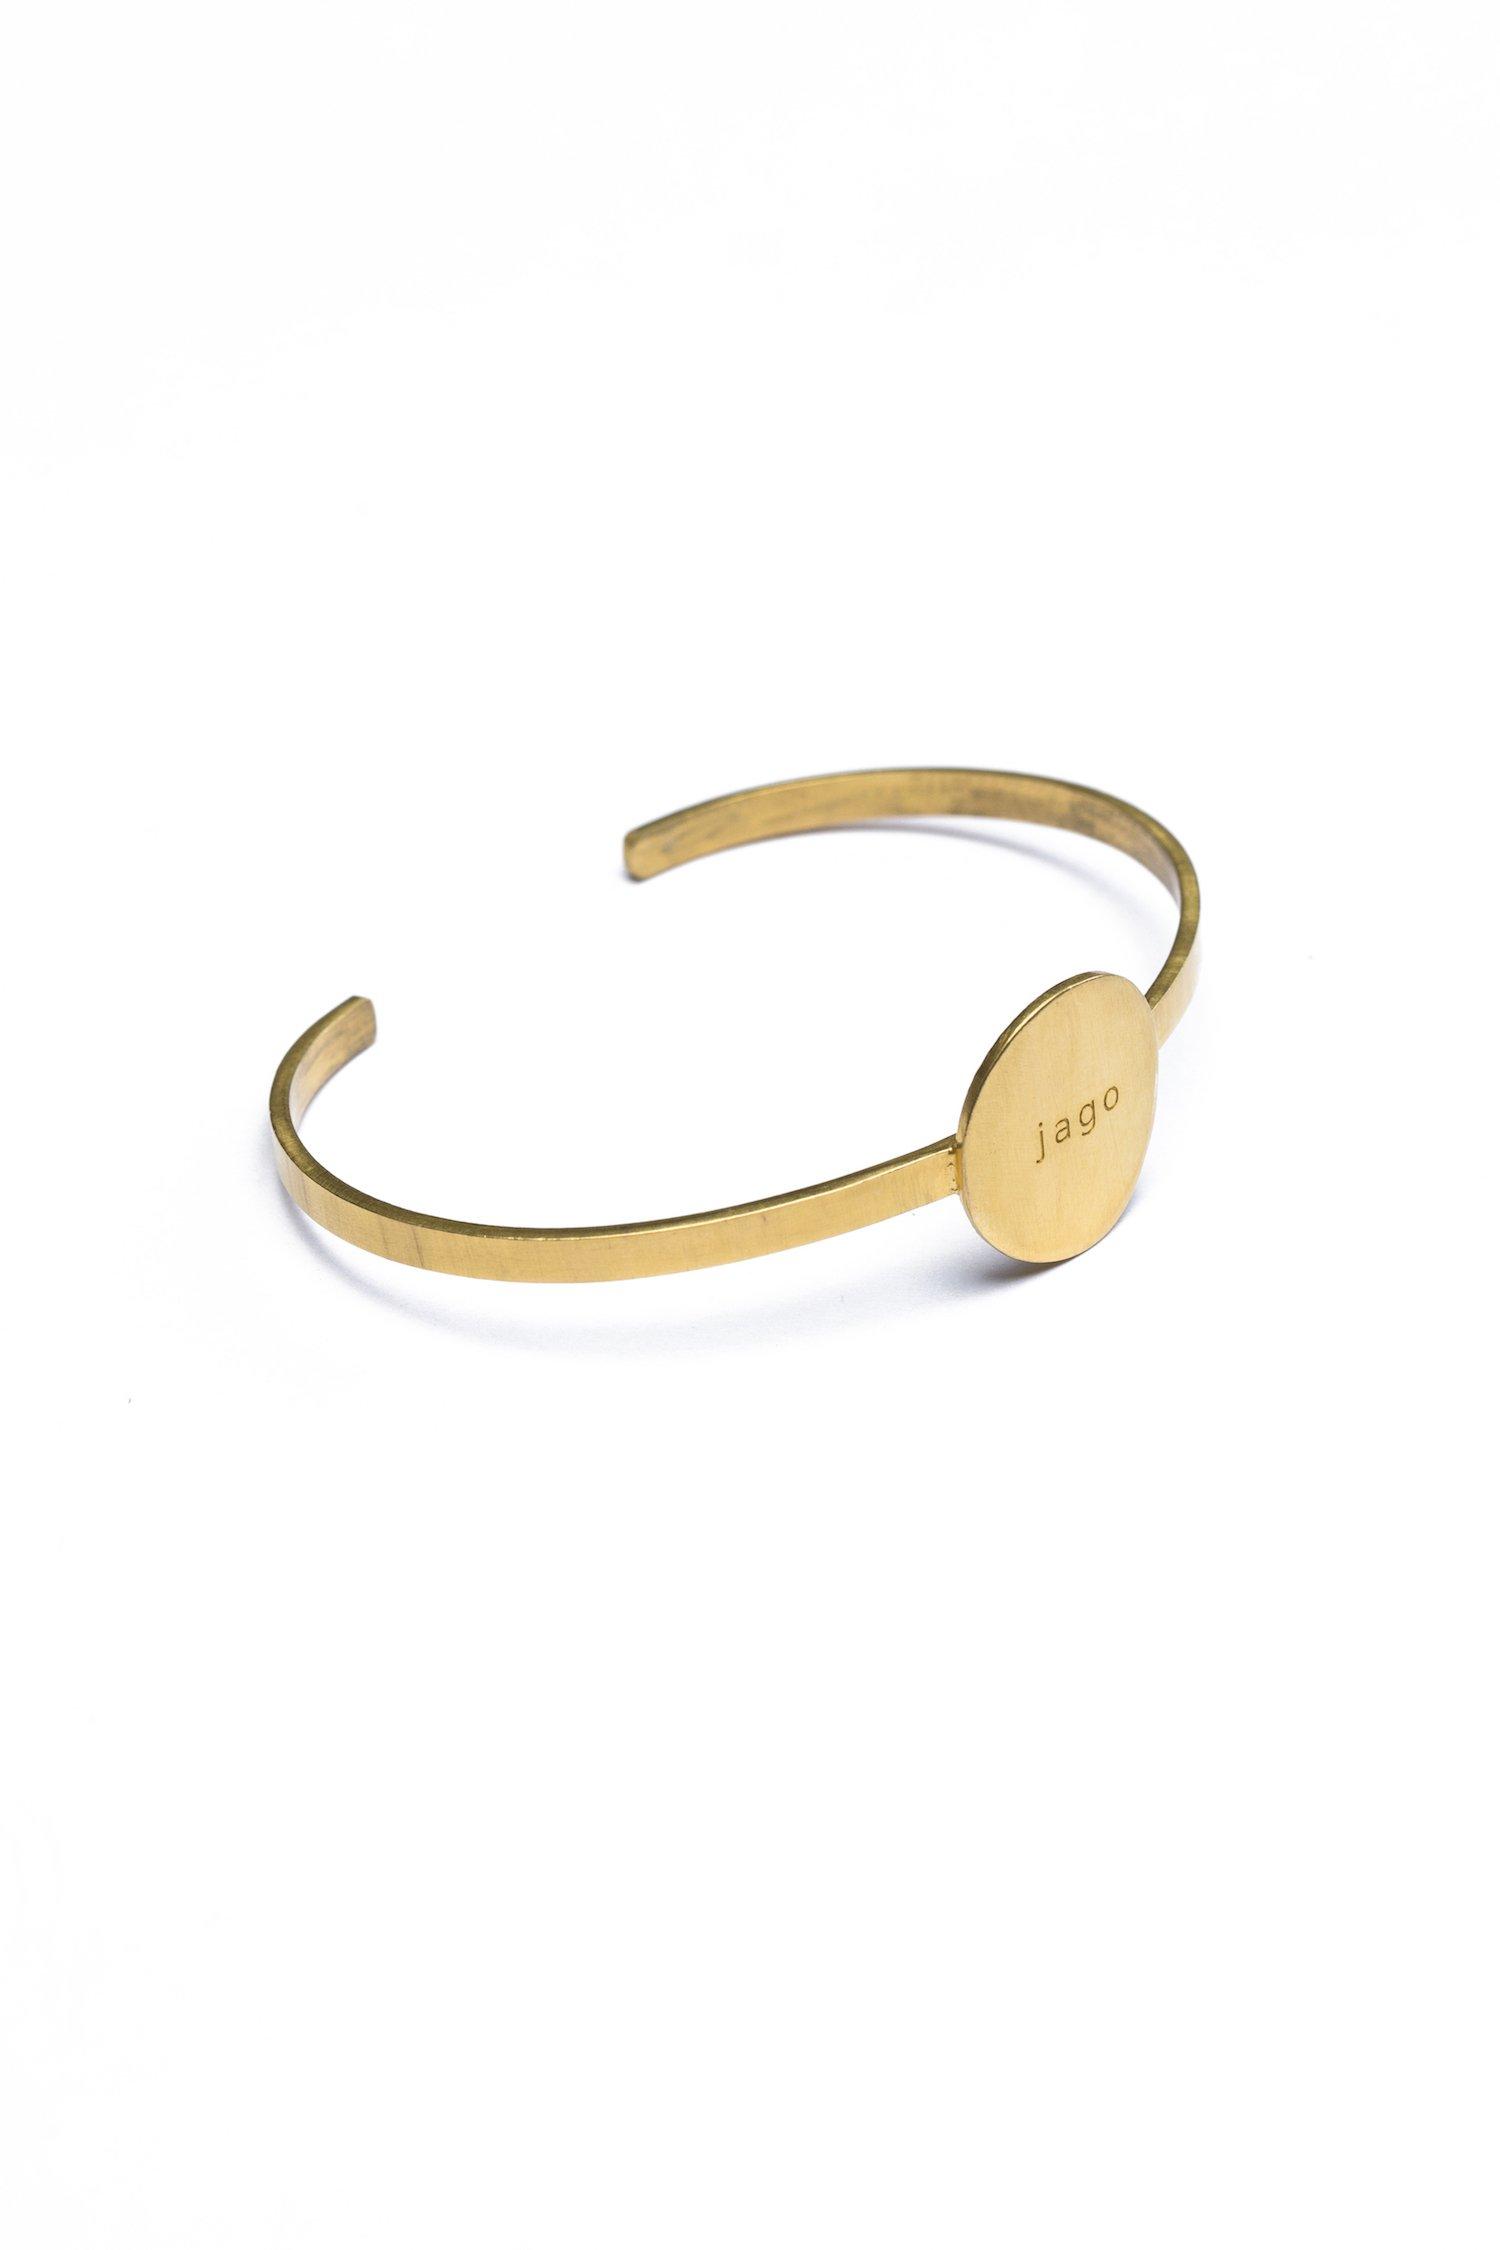 Jago - Prabhu Aap Jago Cuff Bracelet (Gold)